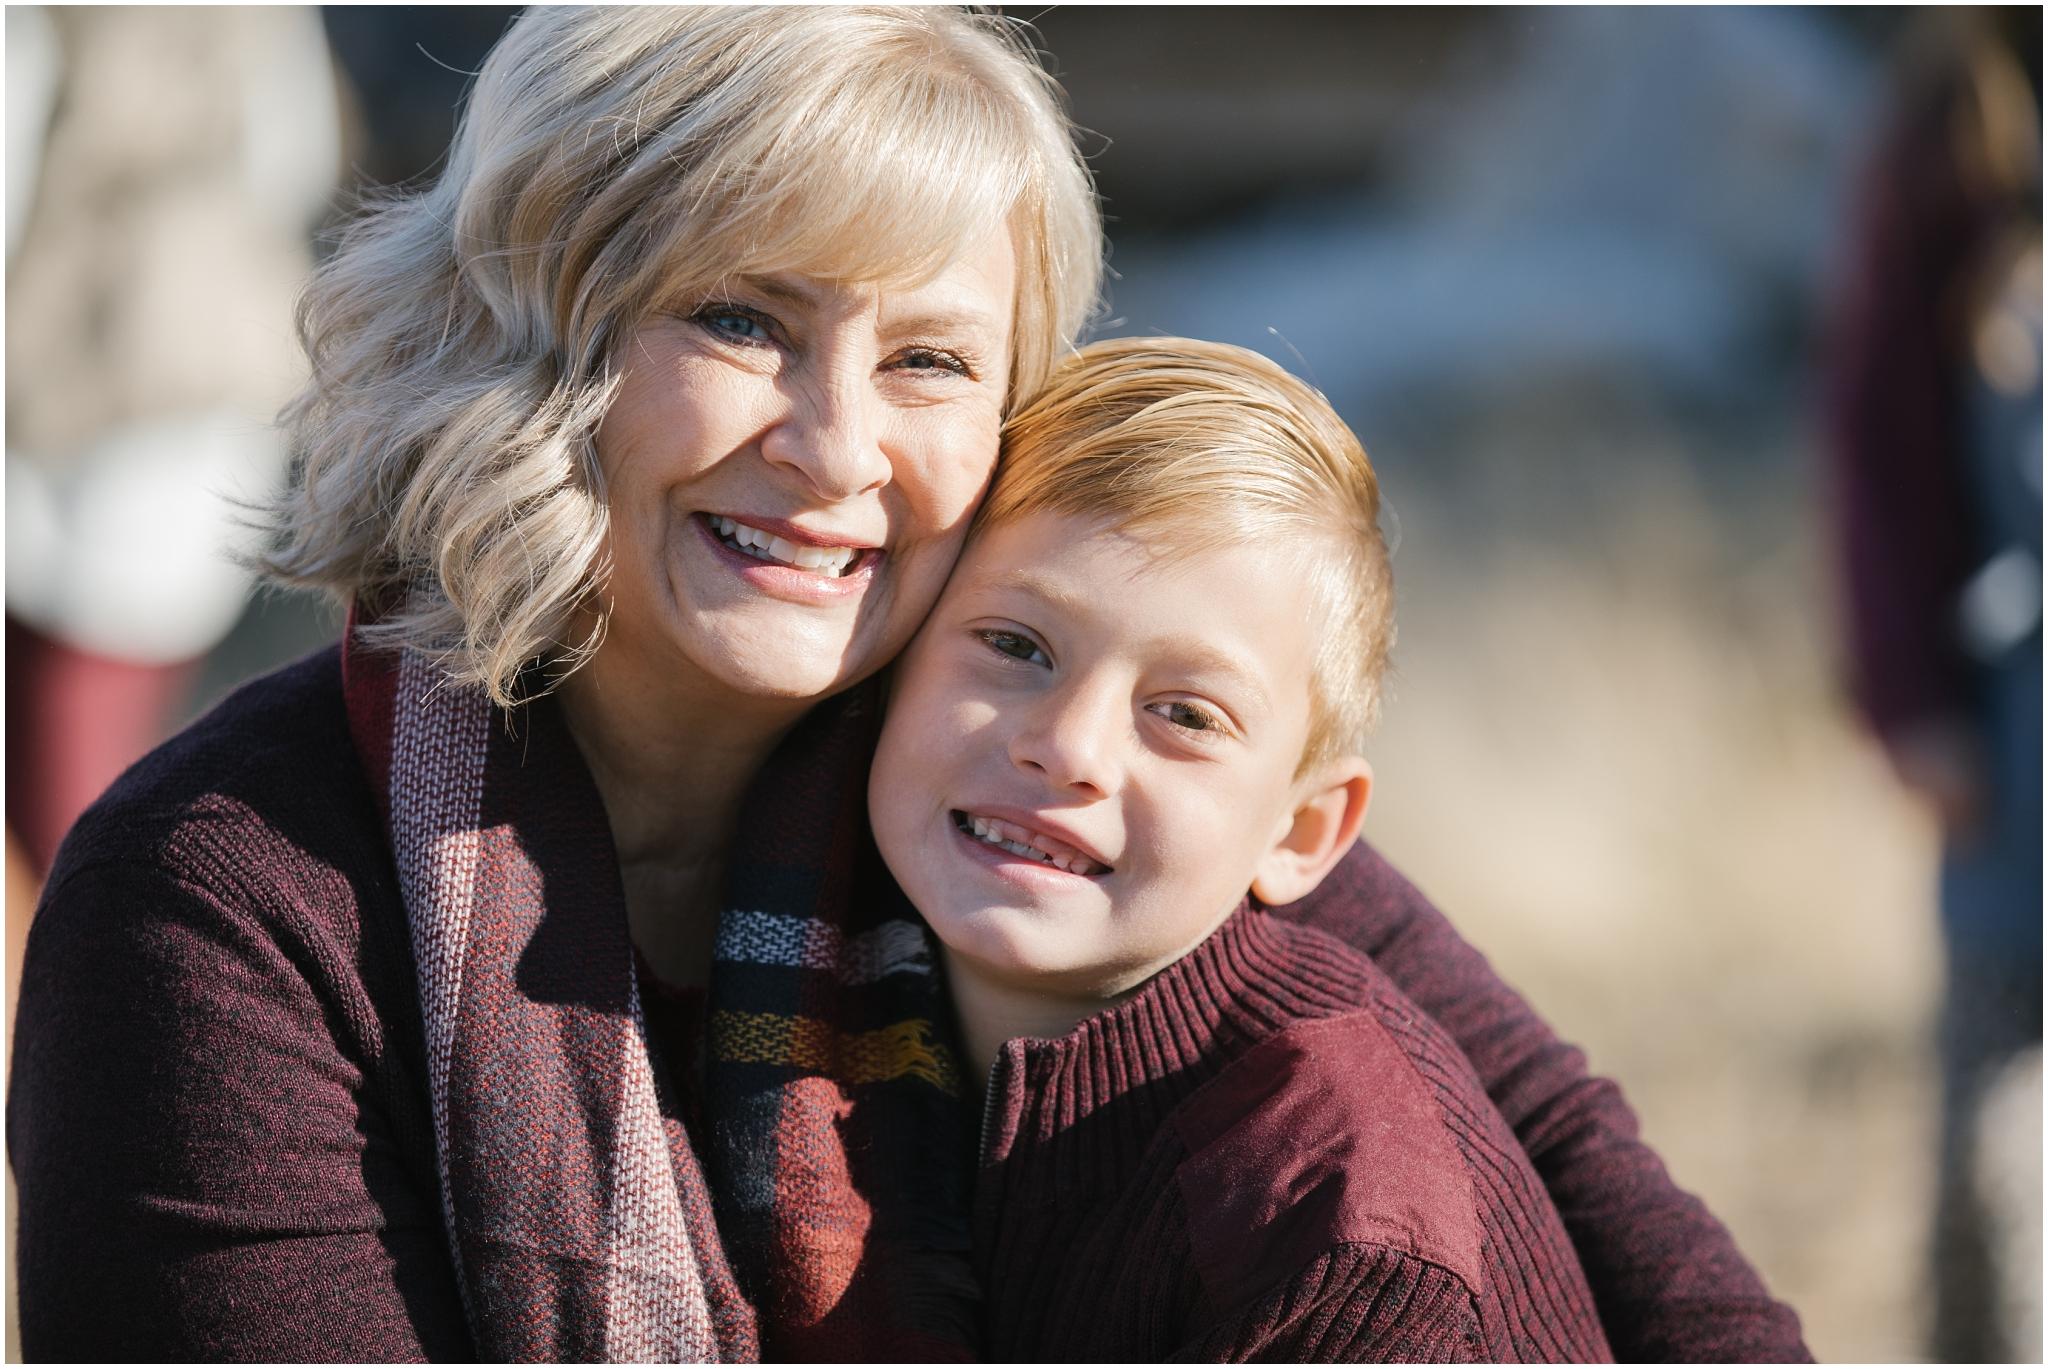 Laws-13_Lizzie-B-Imagery-Utah-Family-Photographer-Salt-Lake-City-Park-City-Davis-County-Clearfield.jpg